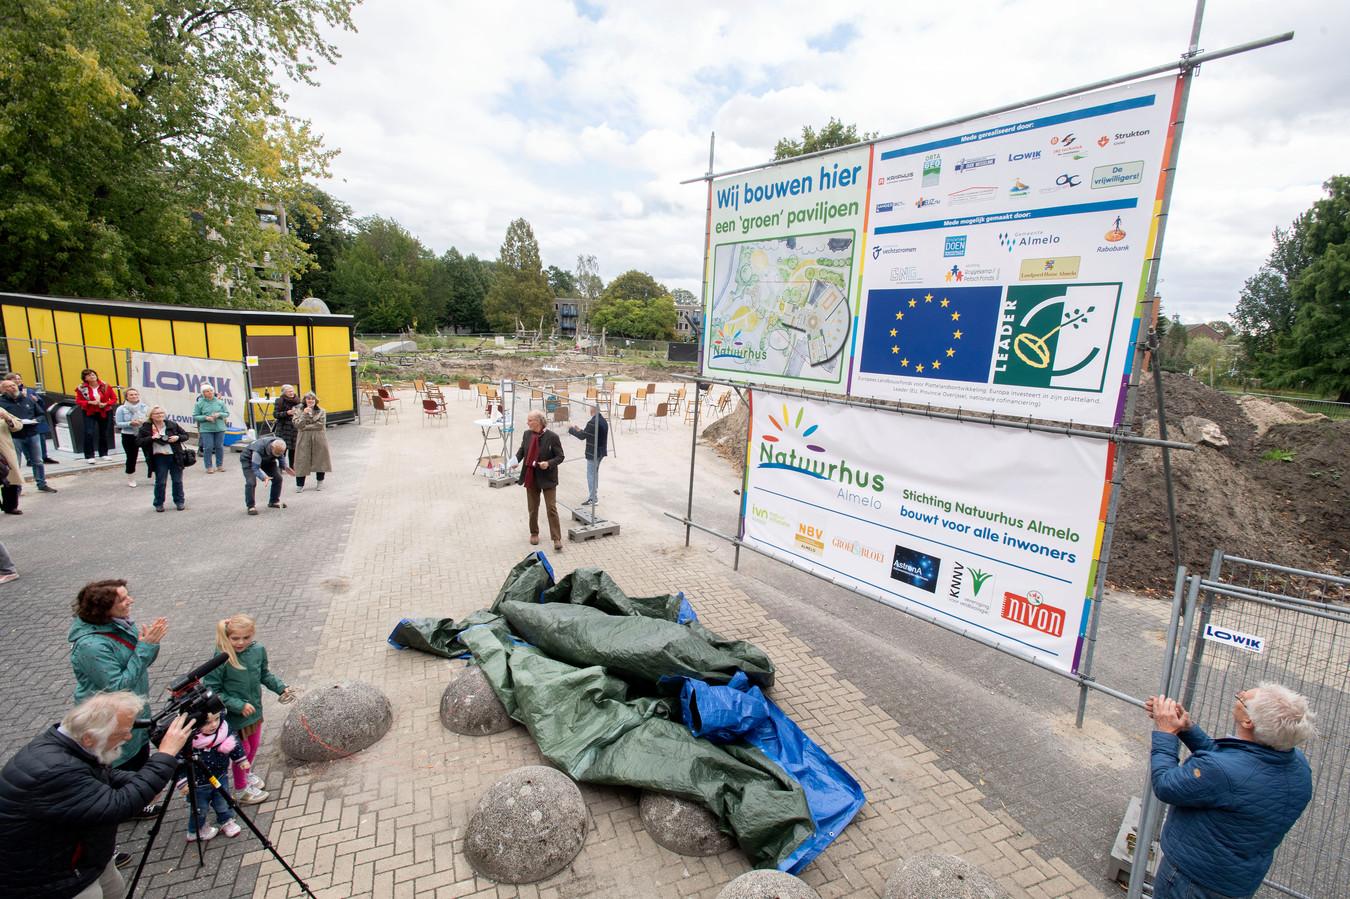 Onthulling bouwbord paviljoen bij Doepark De Hagen. FOTO FRANS NIKKELS